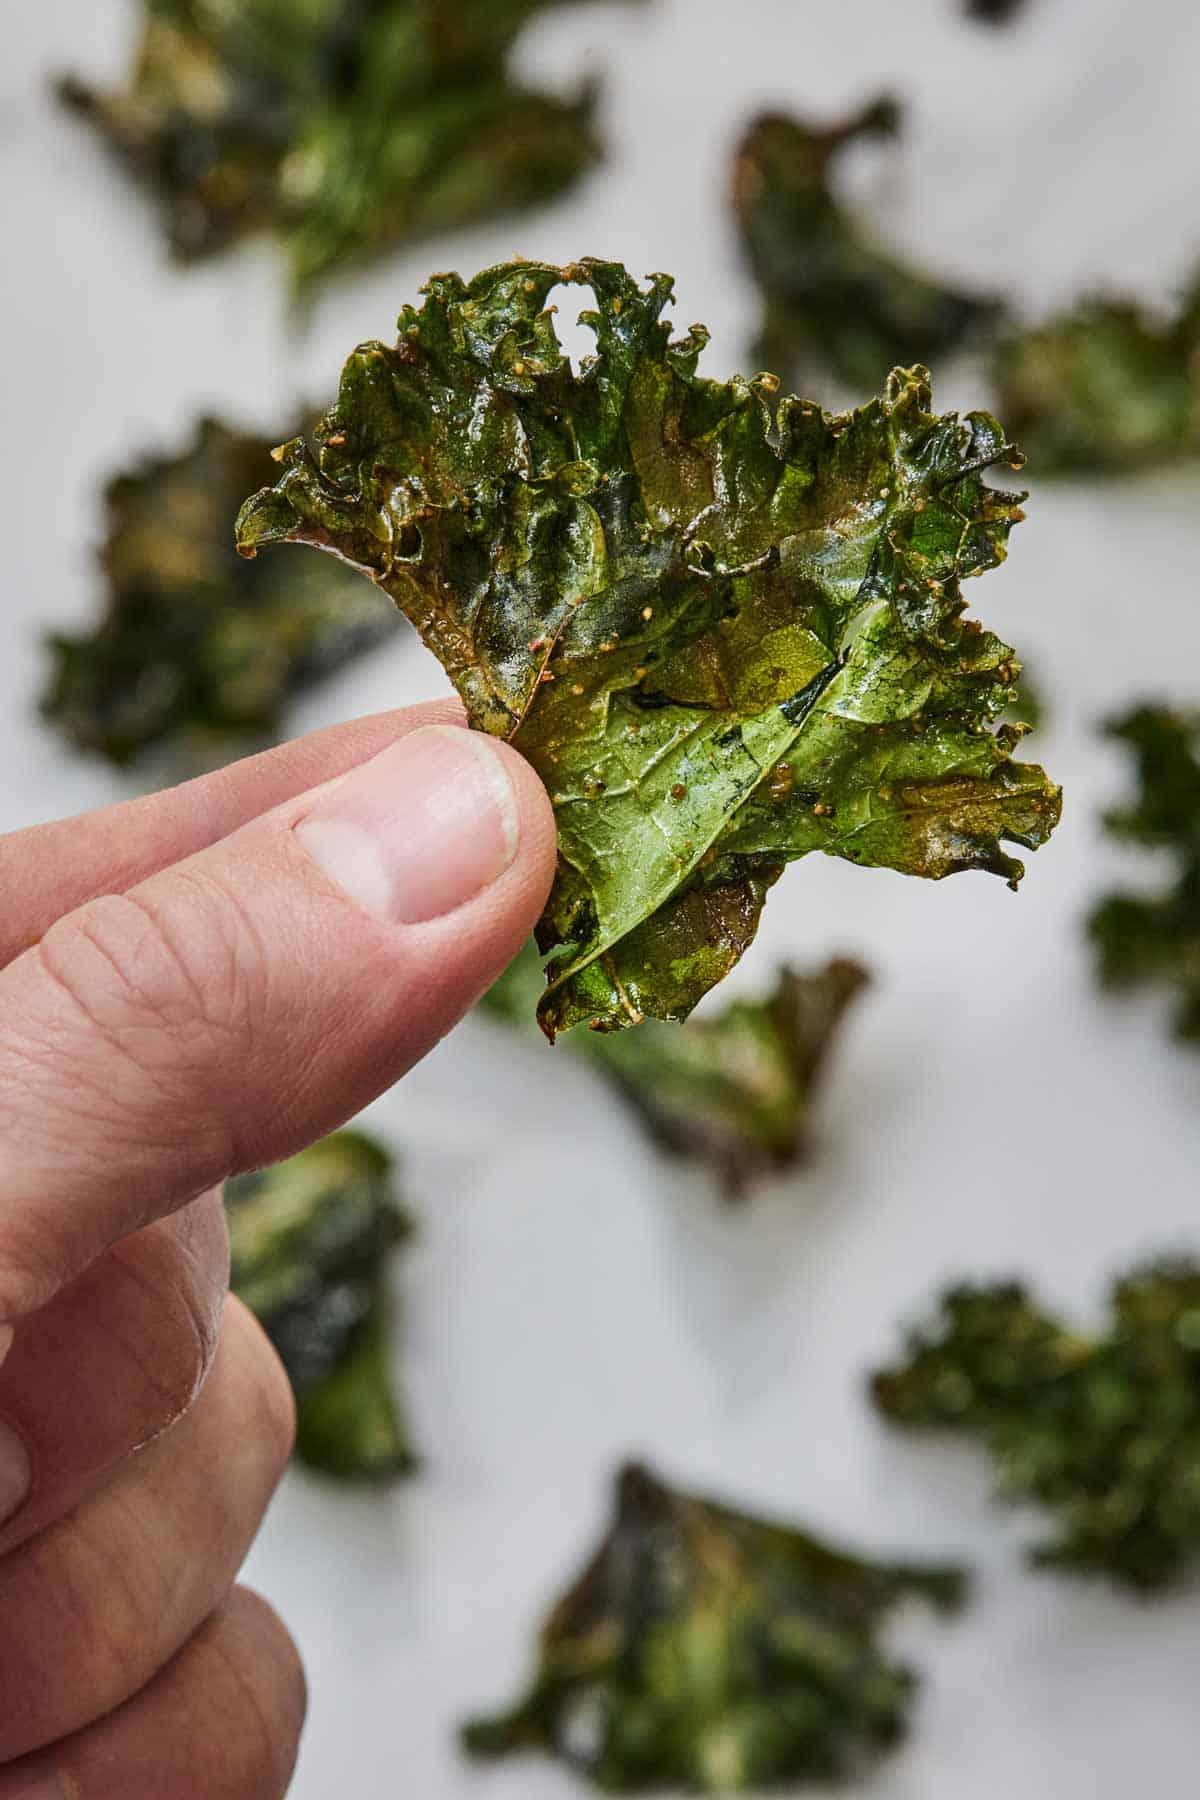 Hand holding a crispy baked kale chip.